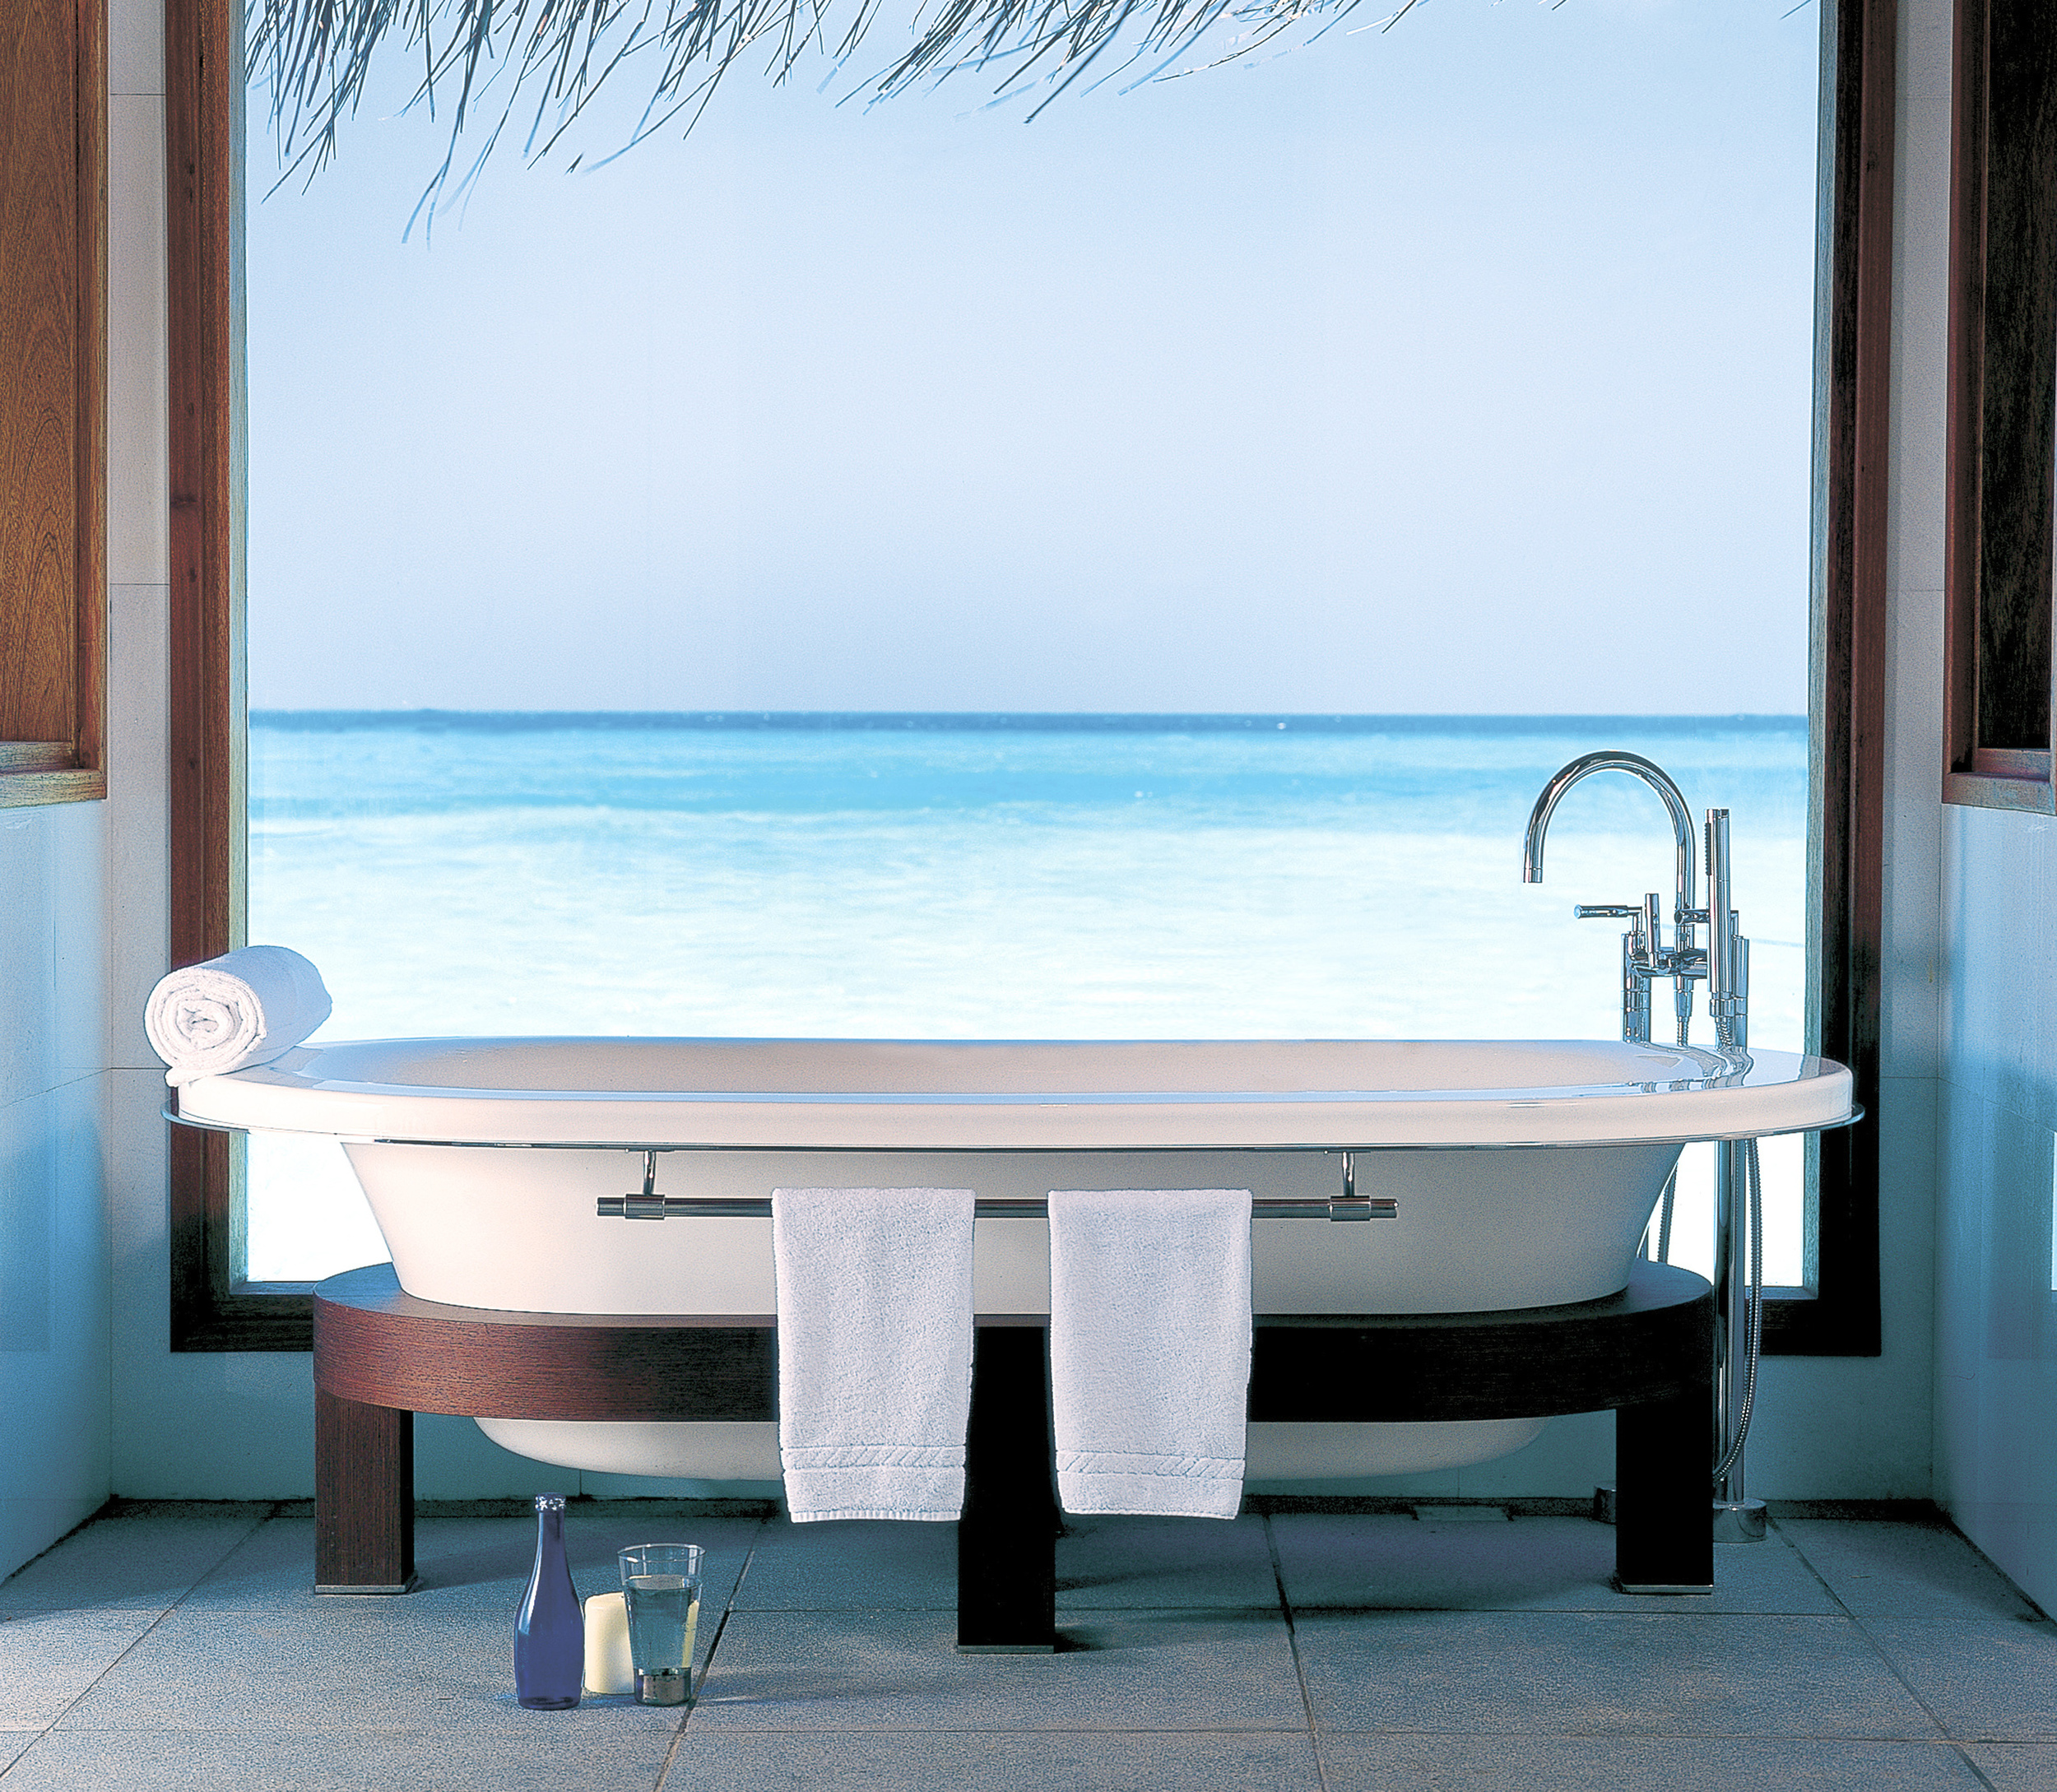 Hi_PHUV_59889957_Lagoon_Bungalow_With_Pool_Bathroom.jpg